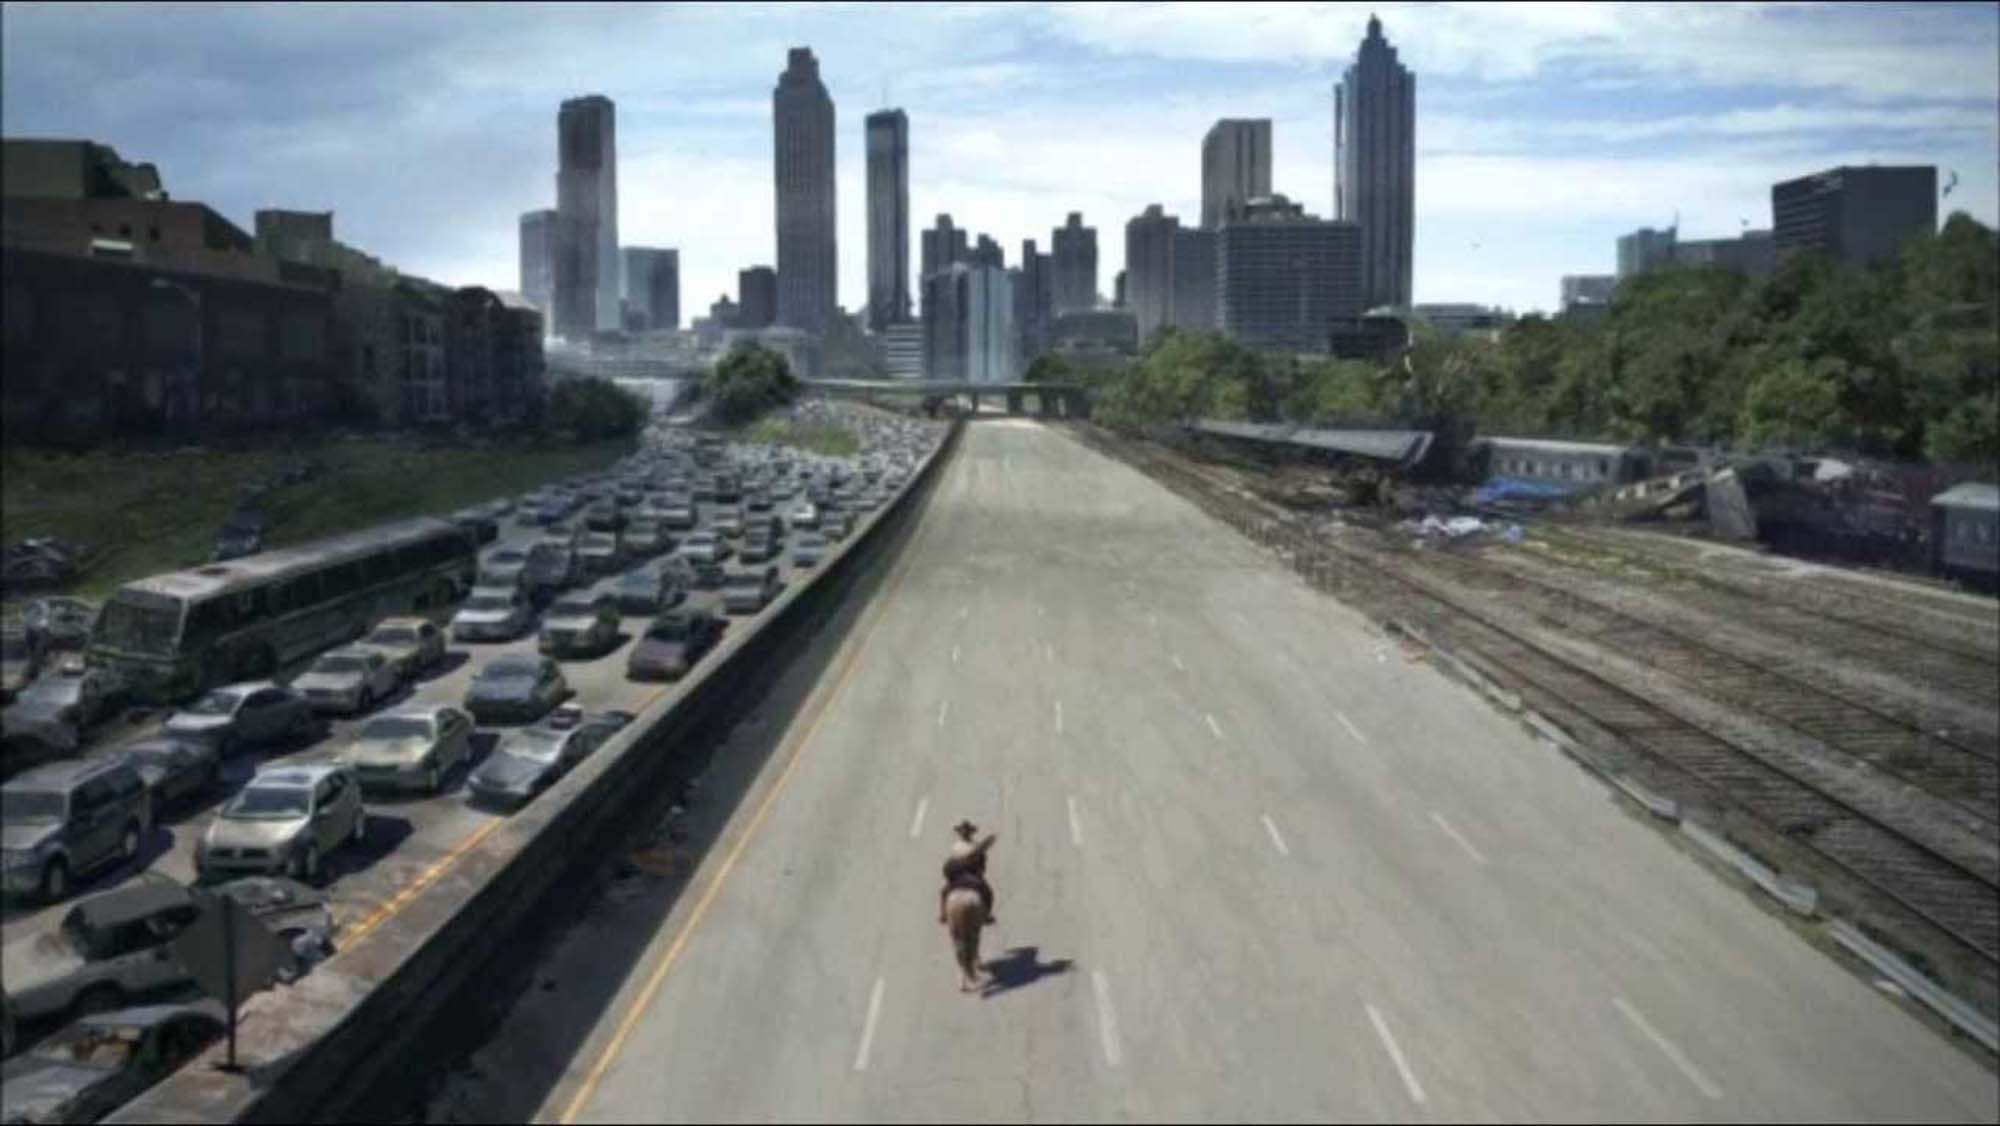 twds01e01b Review: The Walking Dead S01E01 - Days gone bye